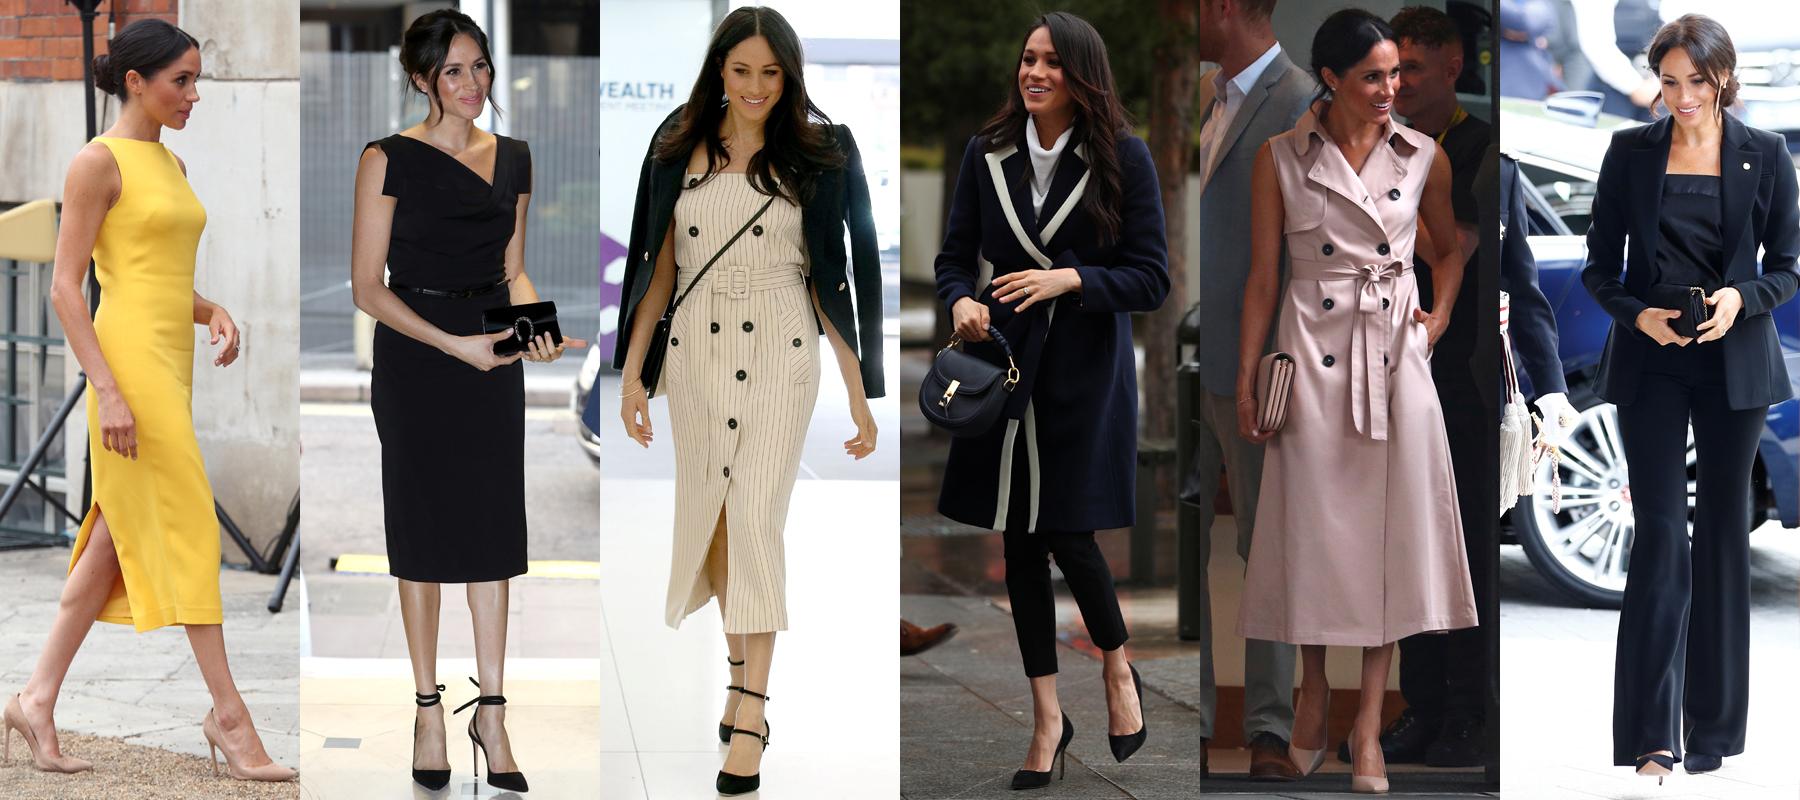 Duchess Meghan Markle is People Magazines best dressed celeb